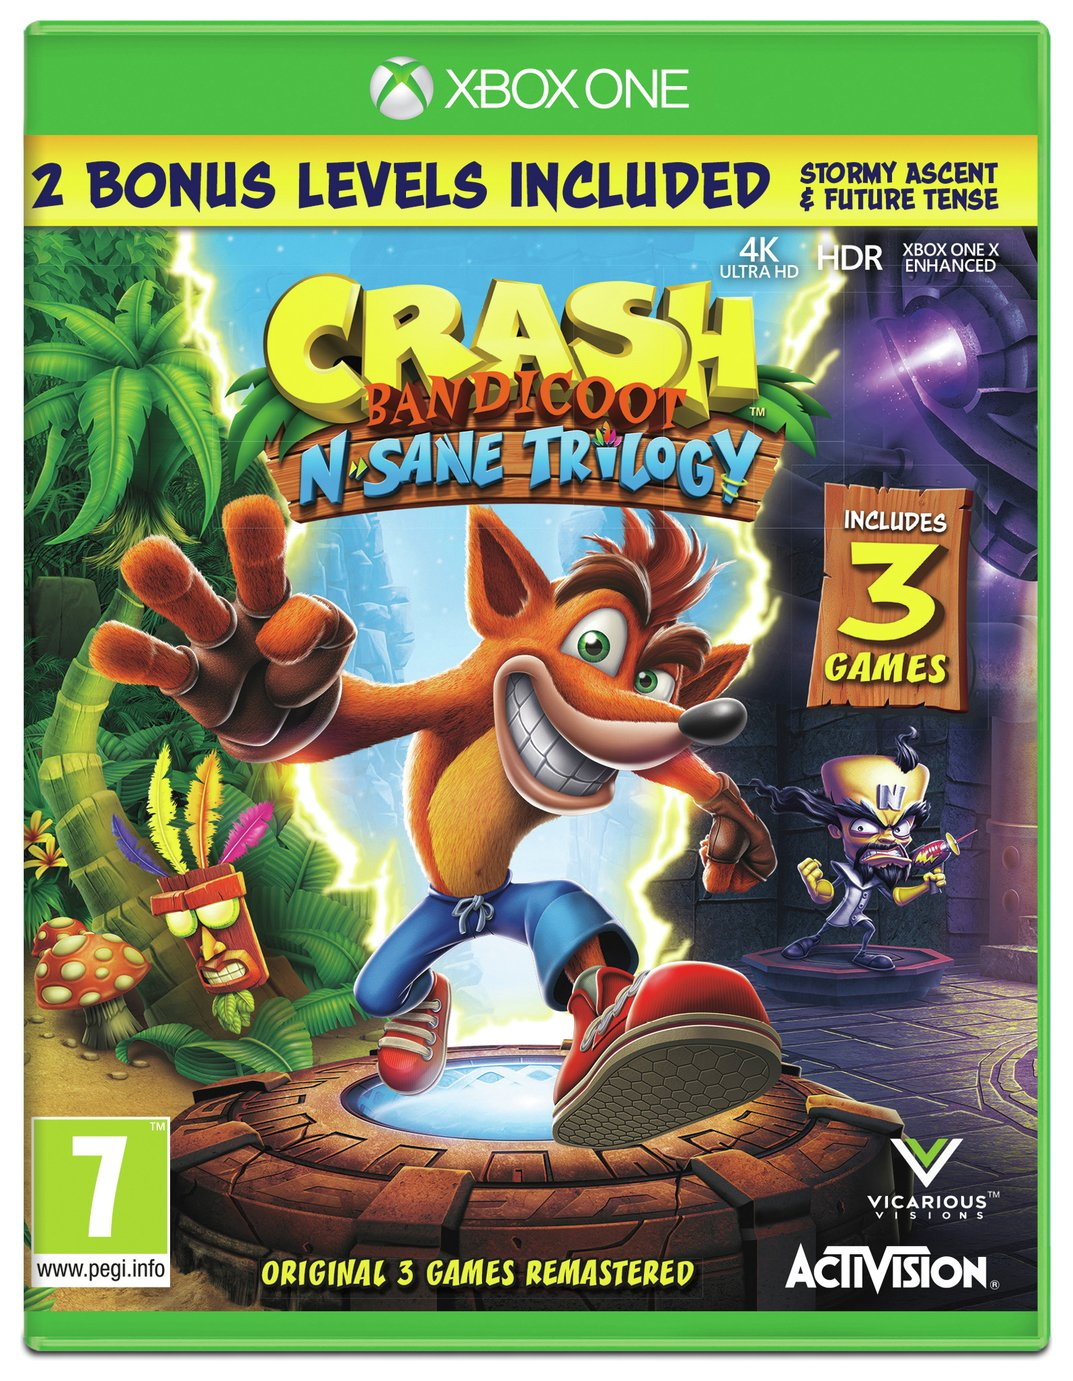 Crash Bandicoot N.Sane Trilogy Xbox One Game